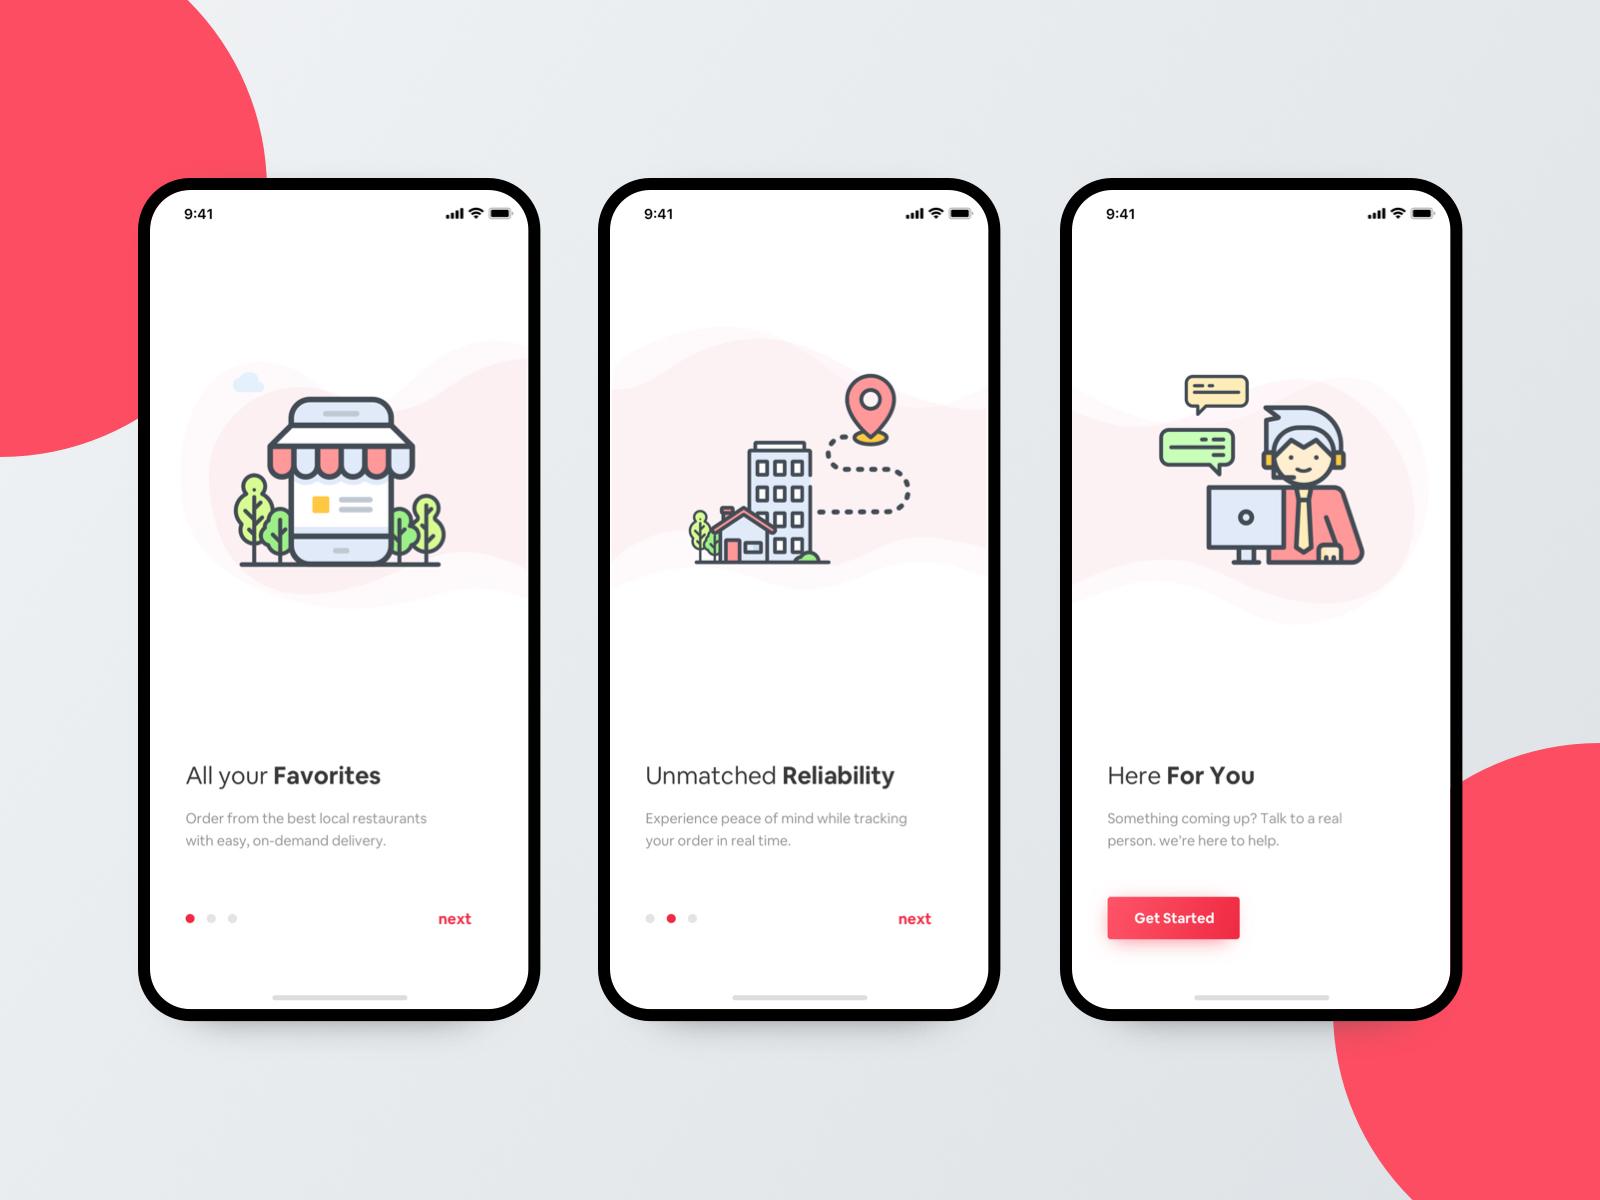 Uber Eats - Onboarding by Mahima - UI/UX Designer for